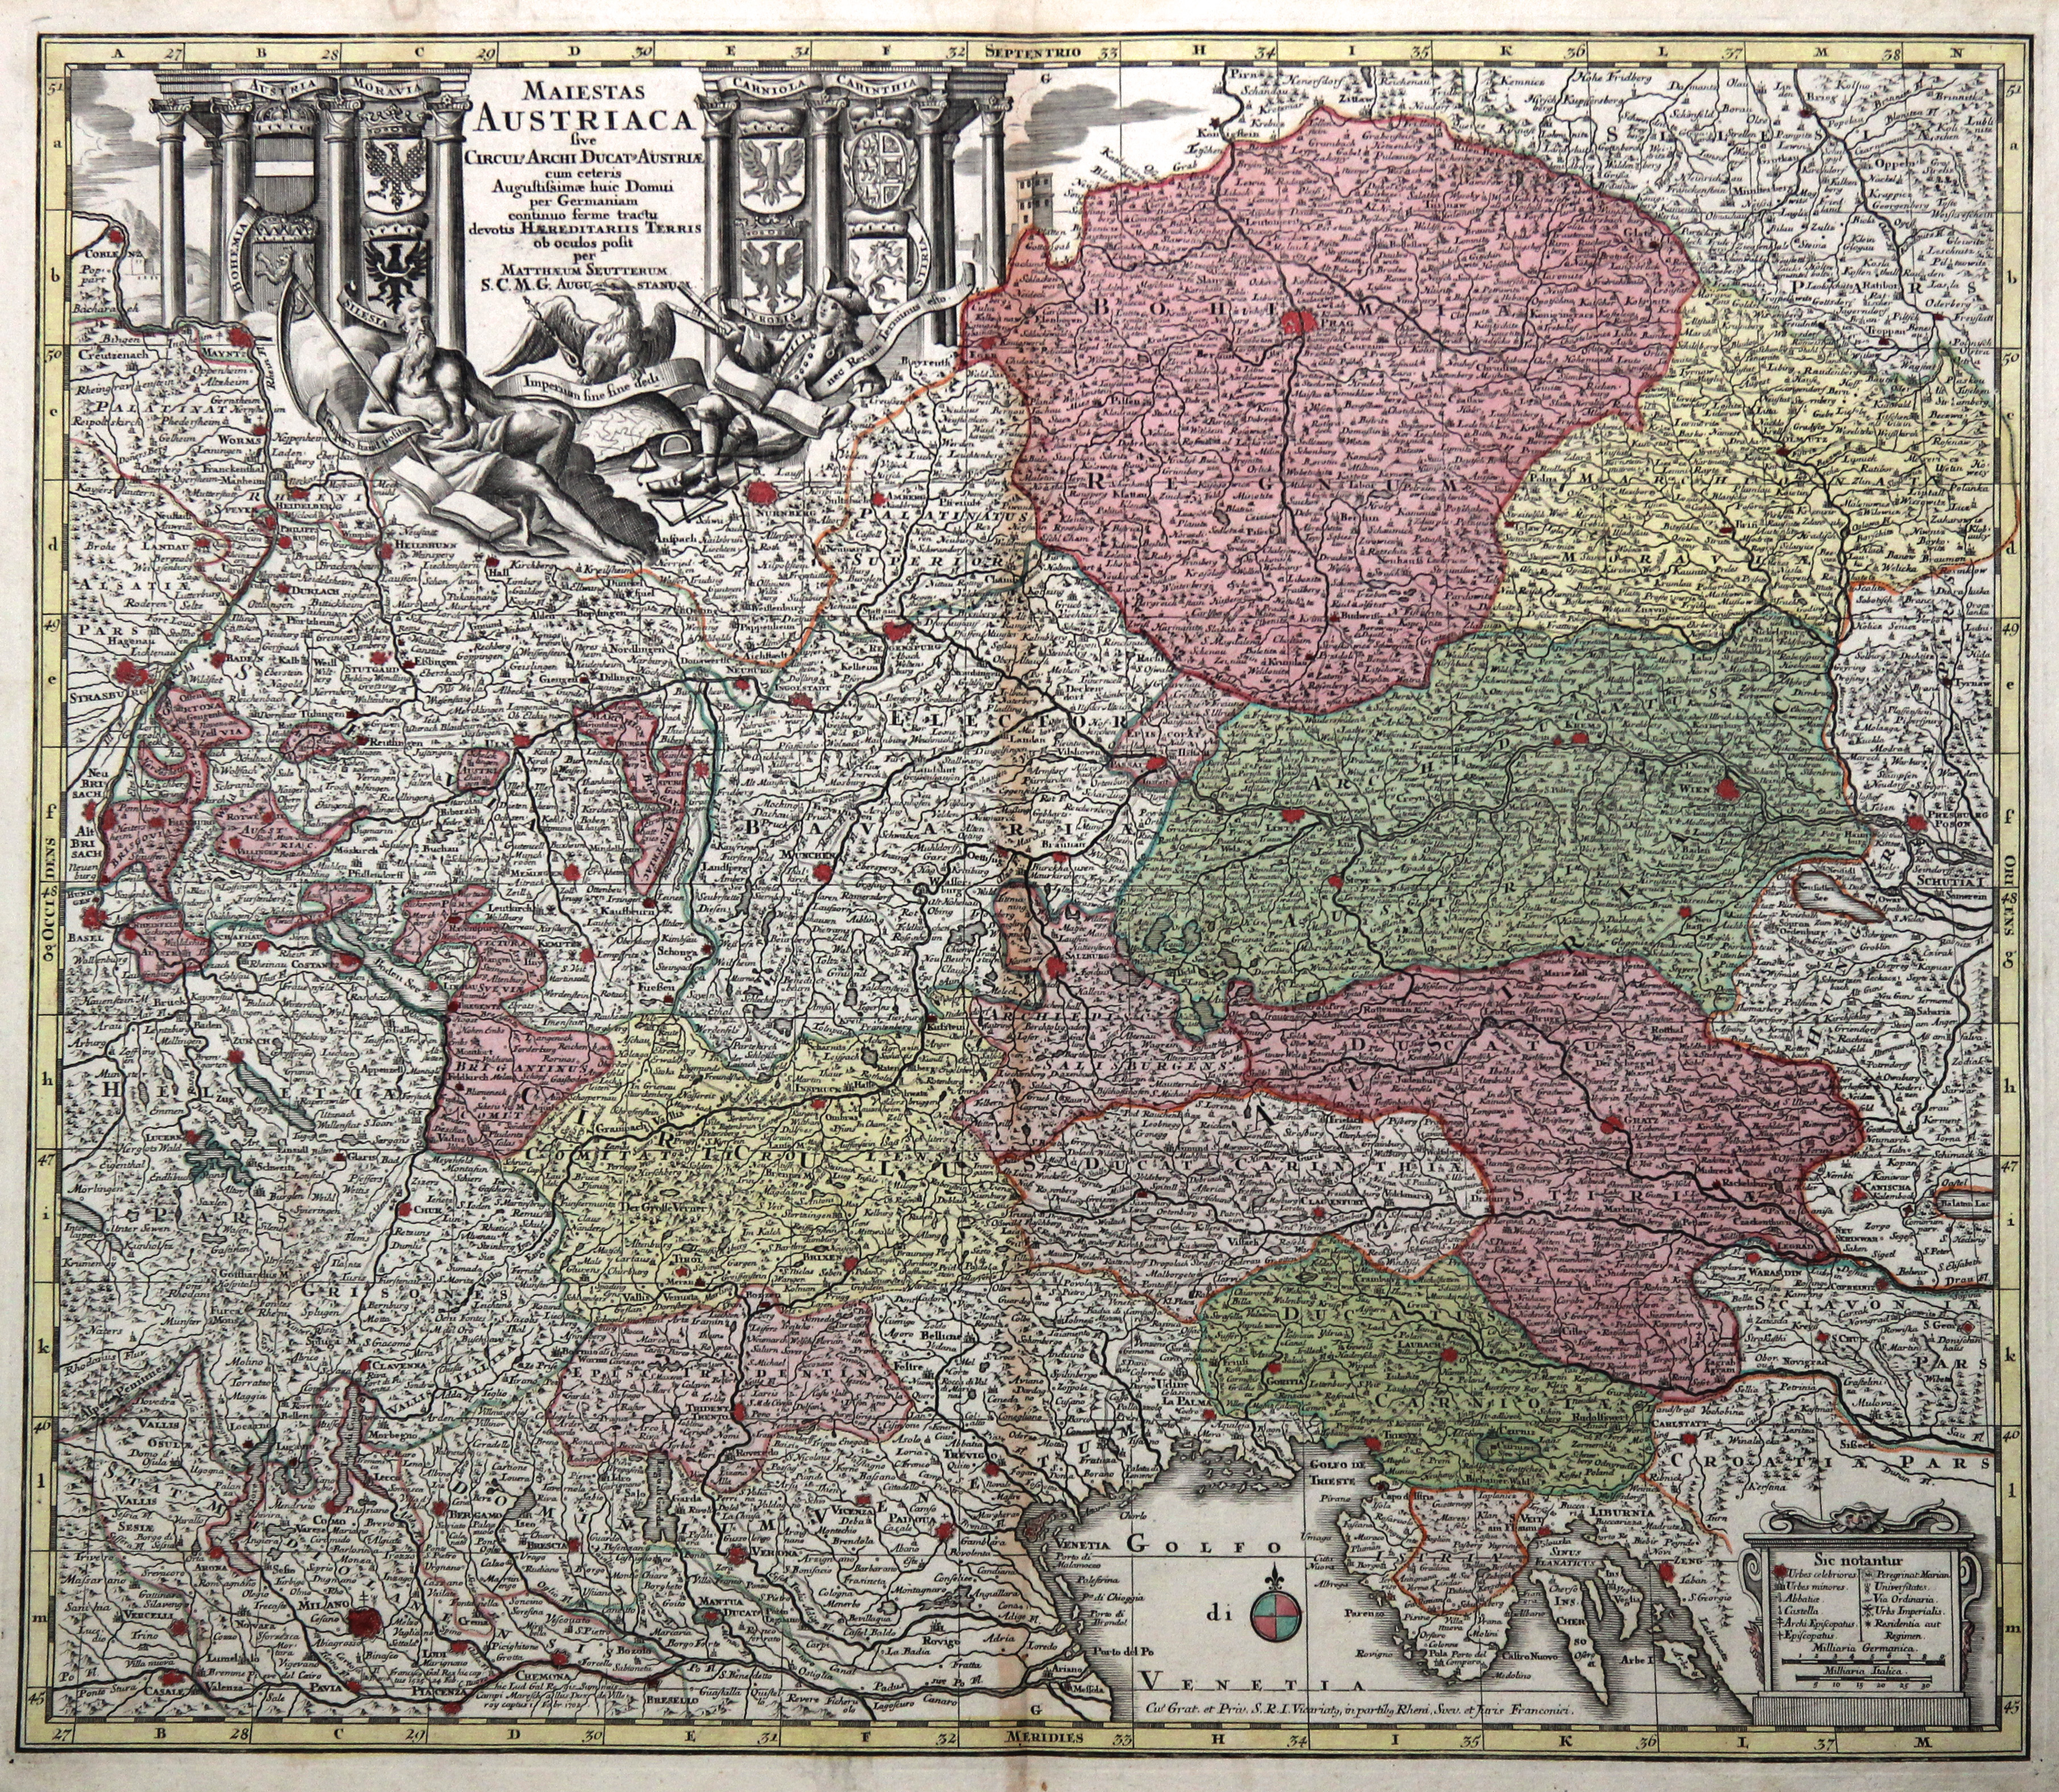 "Kst.- Karte, b. M. Seutter, ""Maiestas Austriaca: Österreichischer Kreis:"